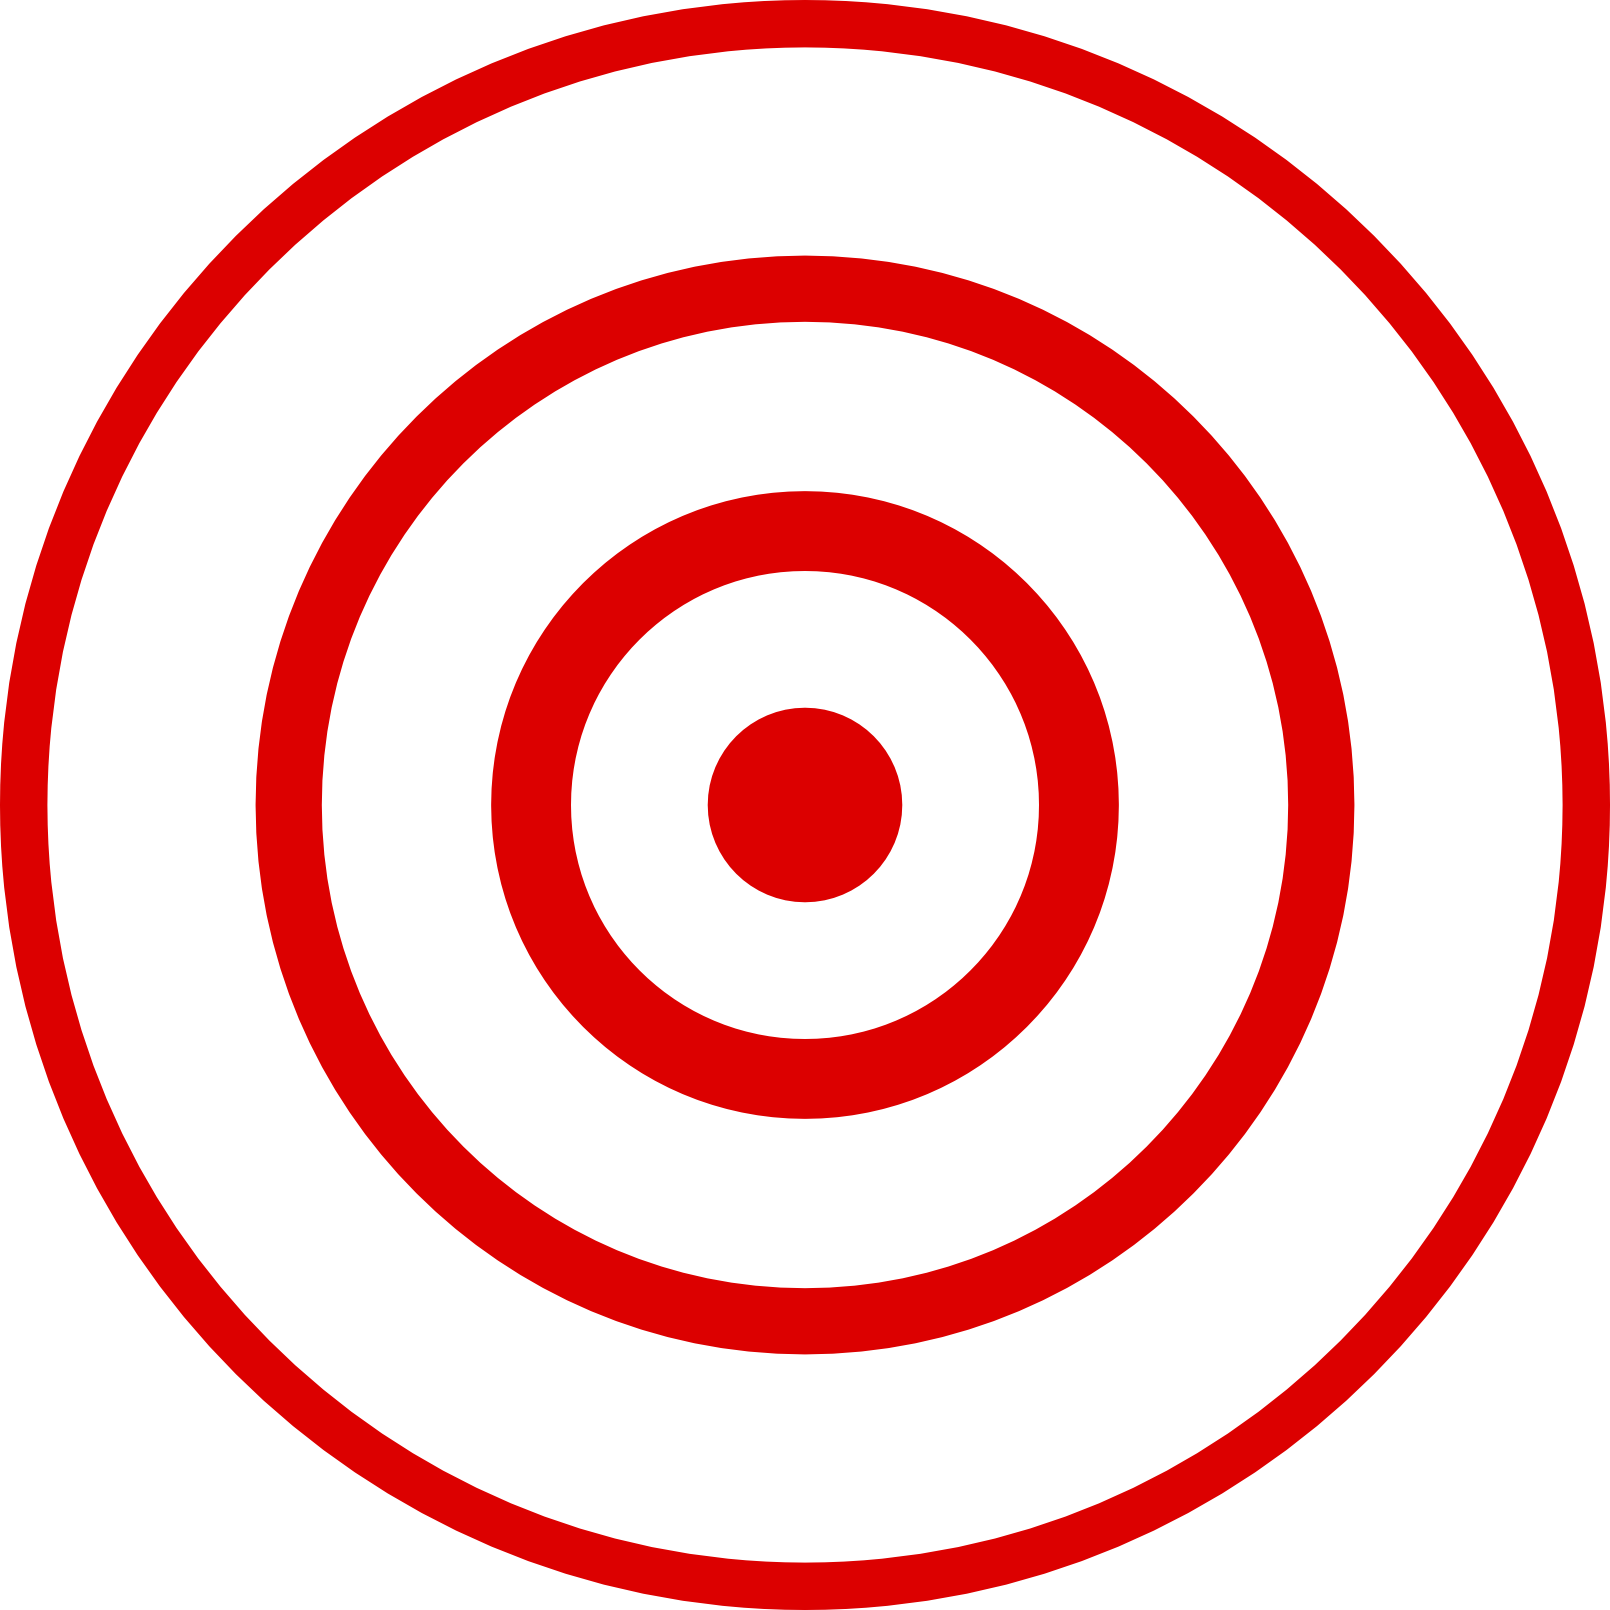 1610x1610 Free Bullseye Clipart Image